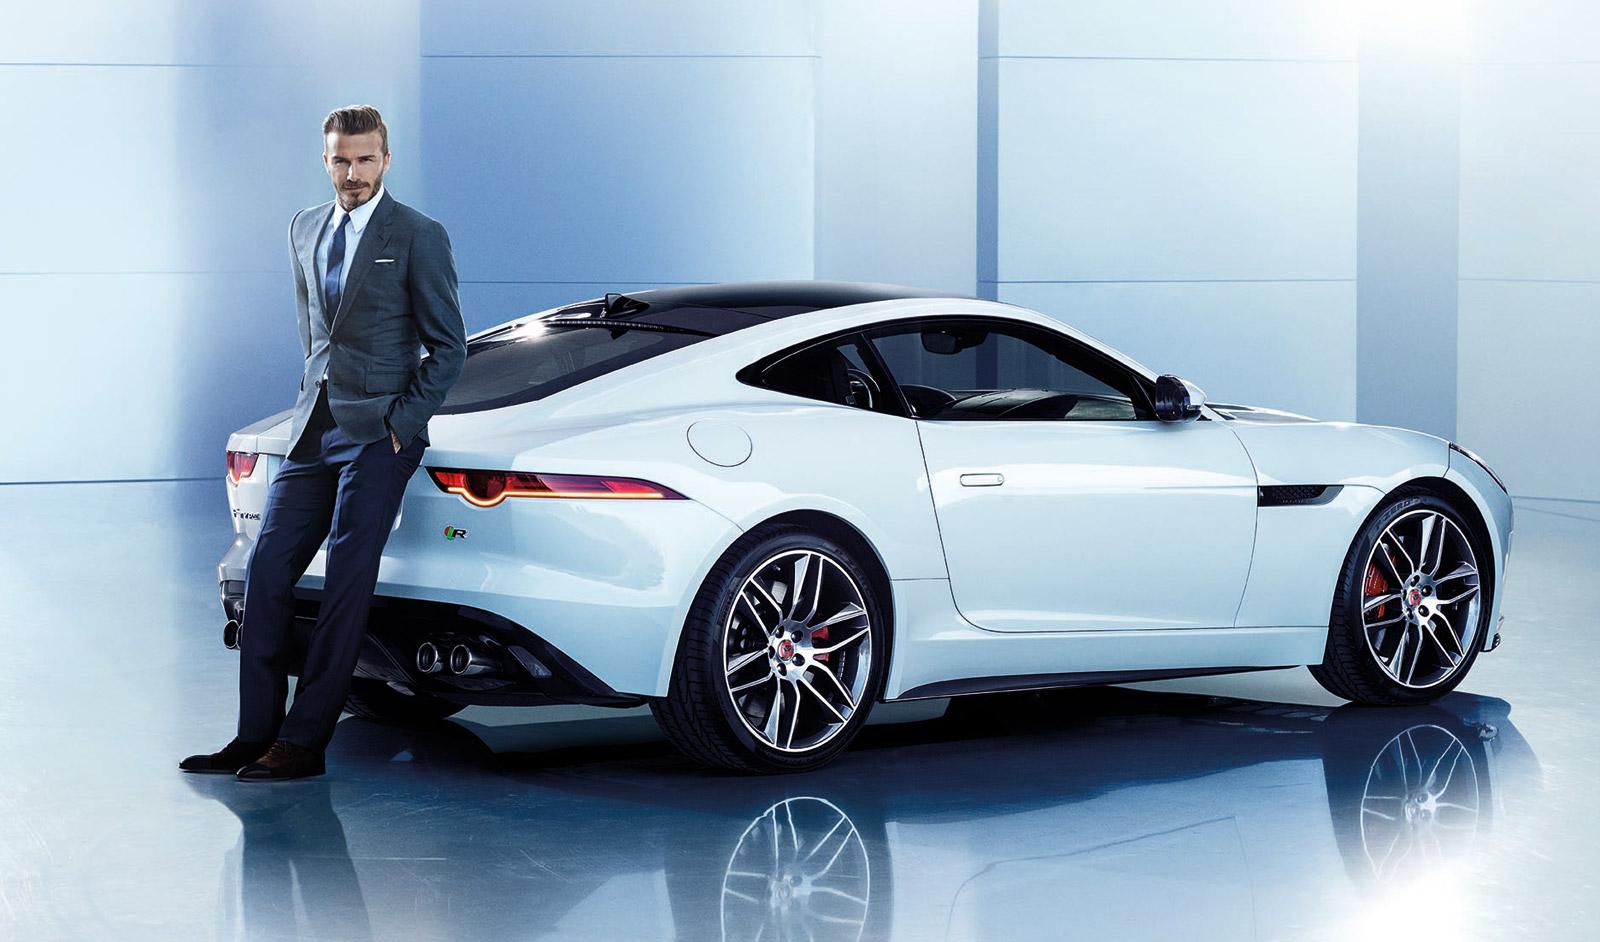 David Beckham To Serve As The Face Of Jaguar In China